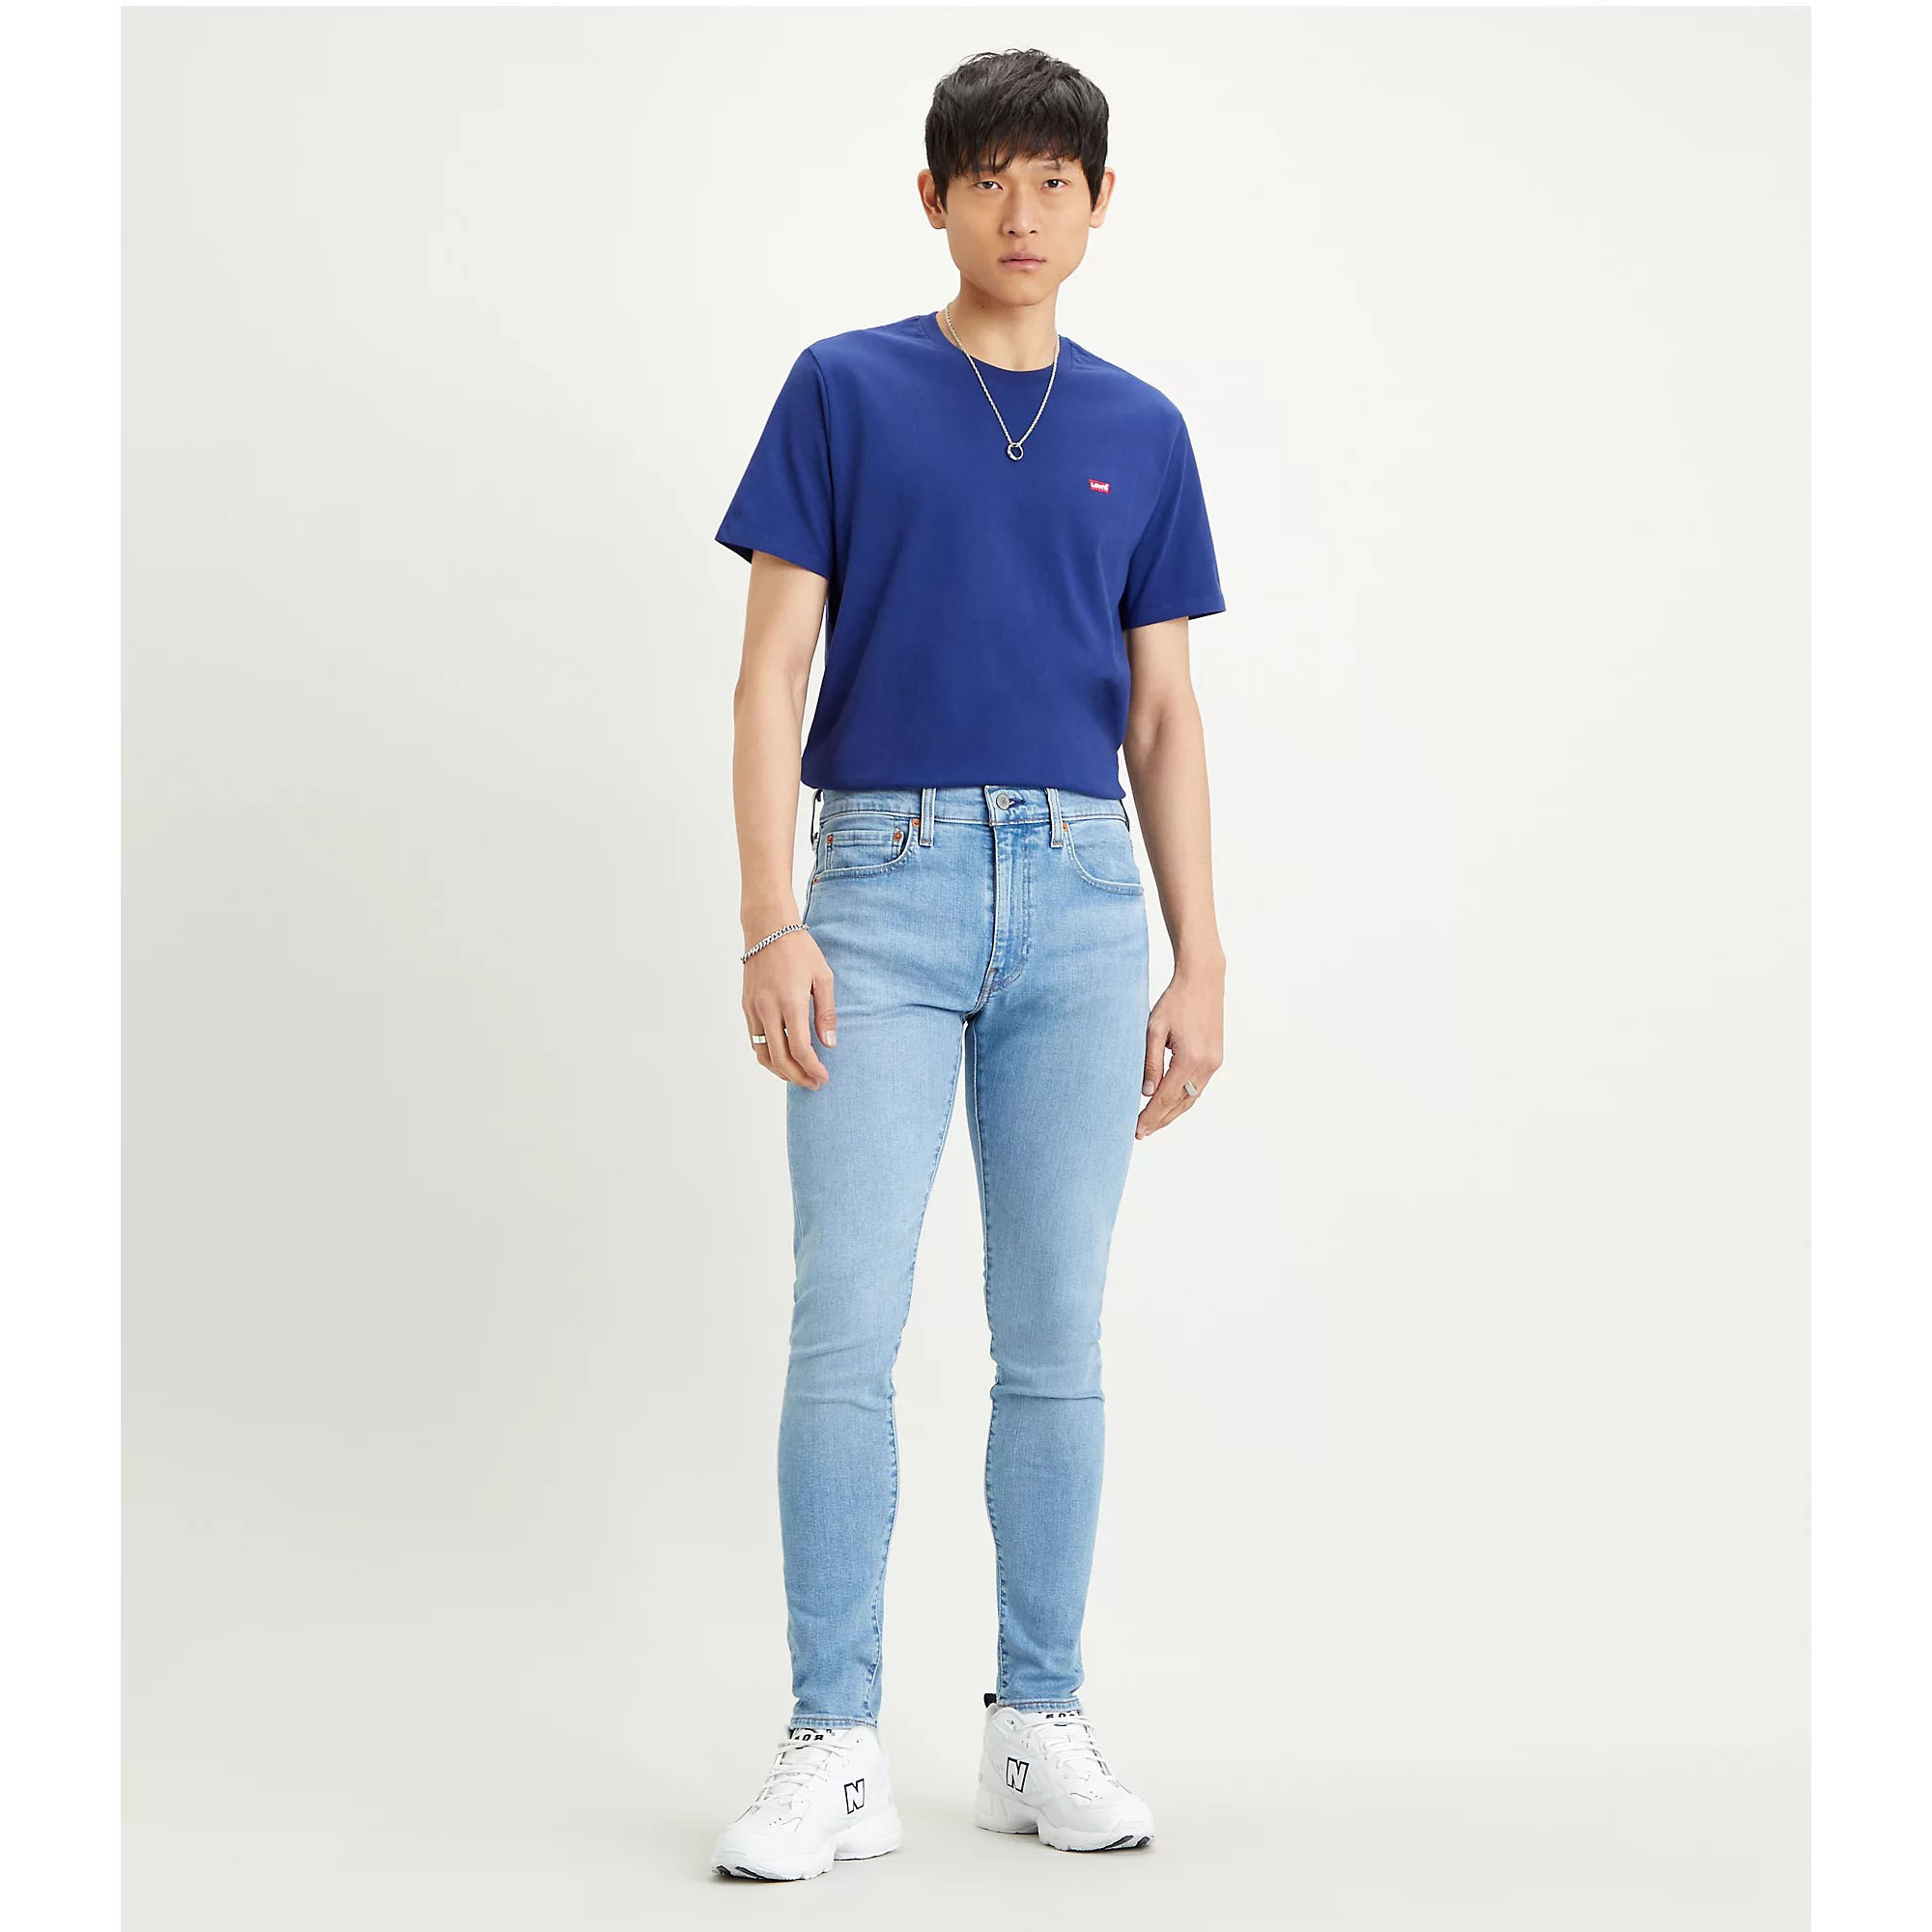 Levi's 510 Skinny Fit Flex Jeans